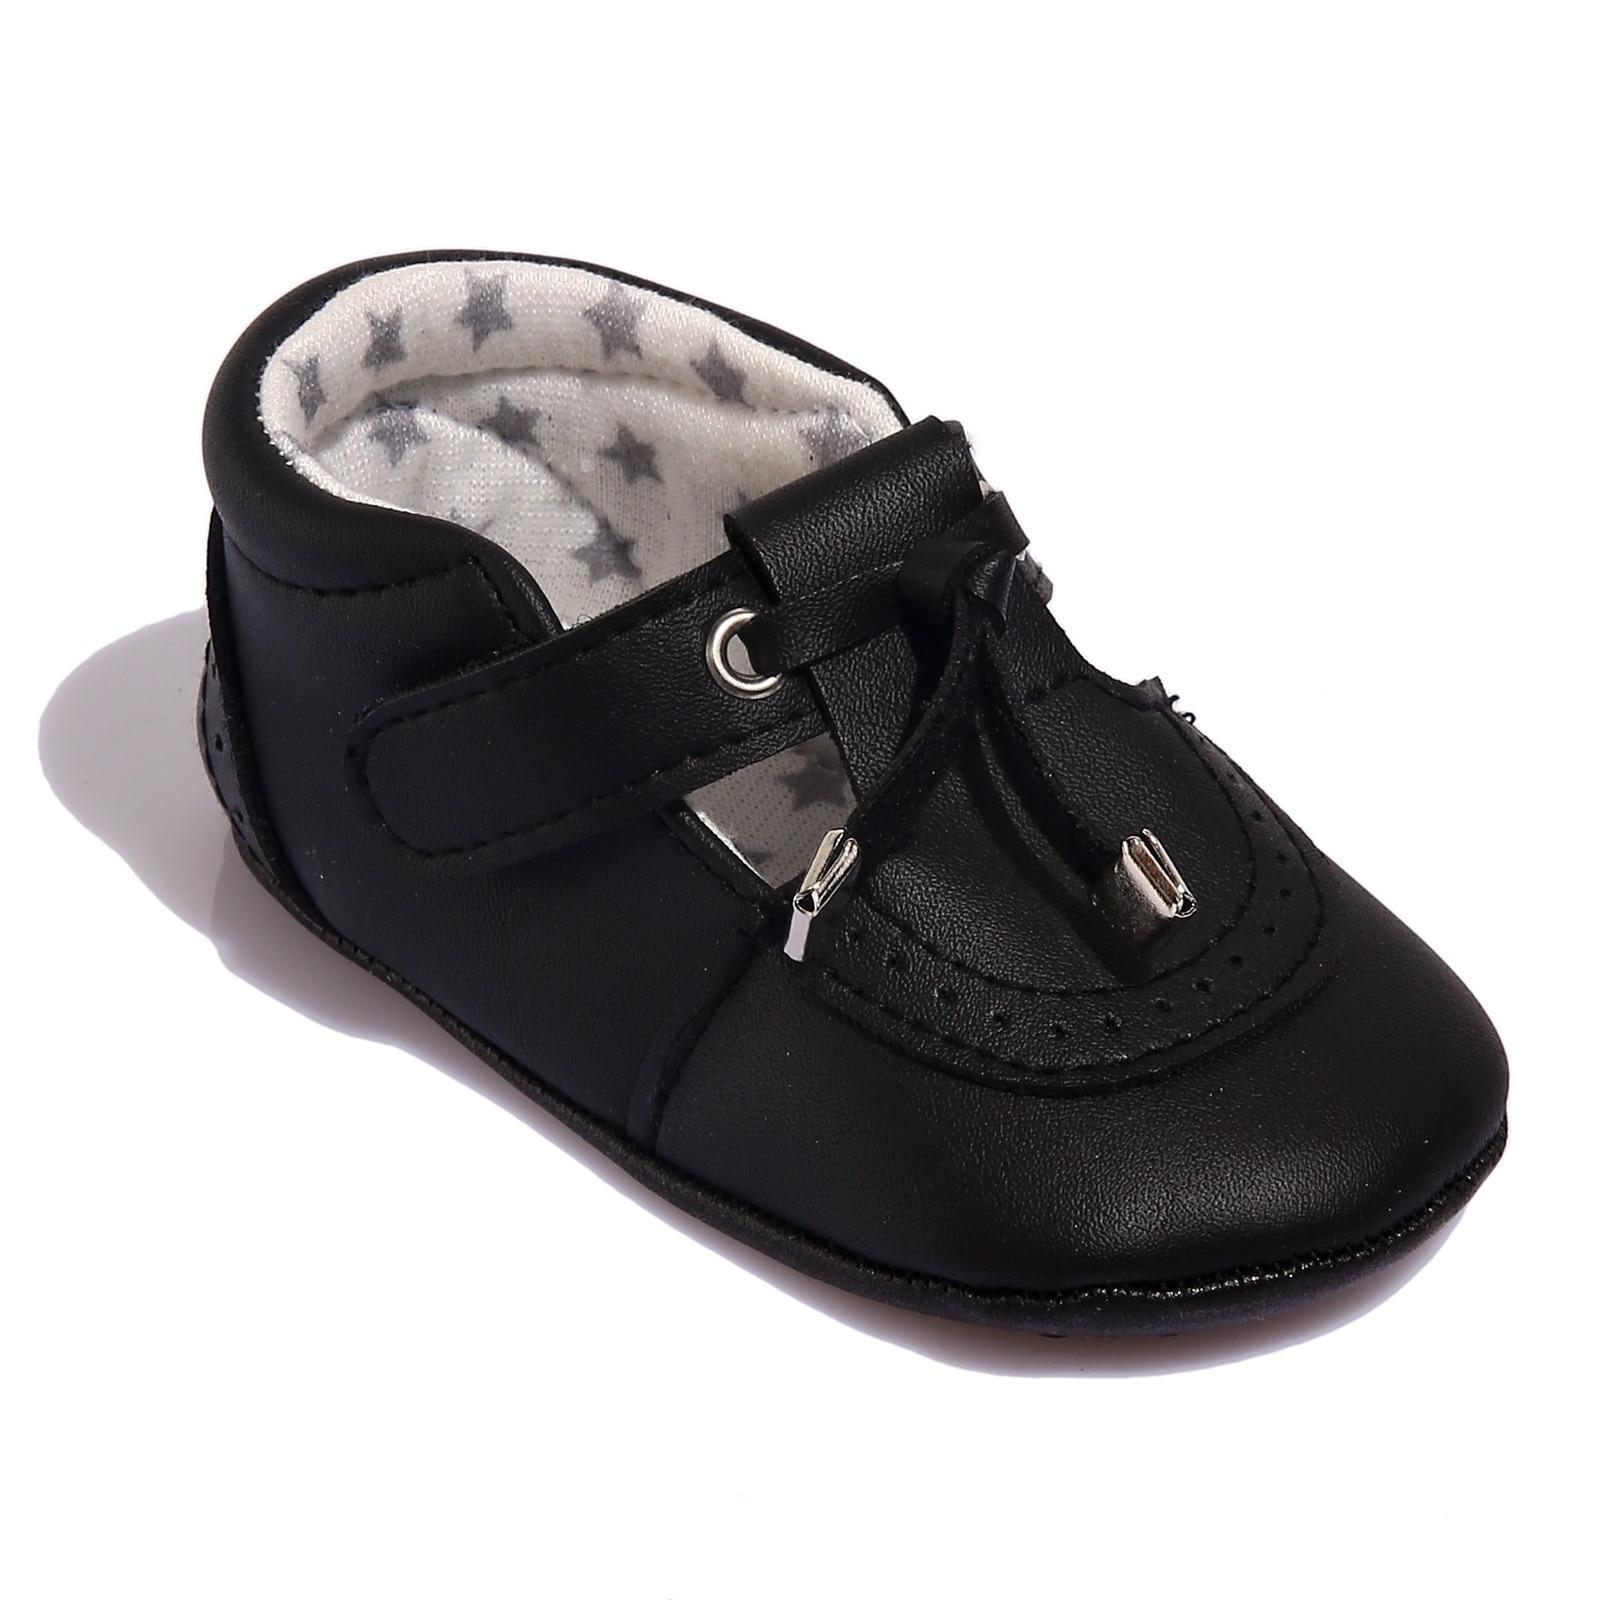 ebebek Funny Patik Summer Baby Boy Shoes